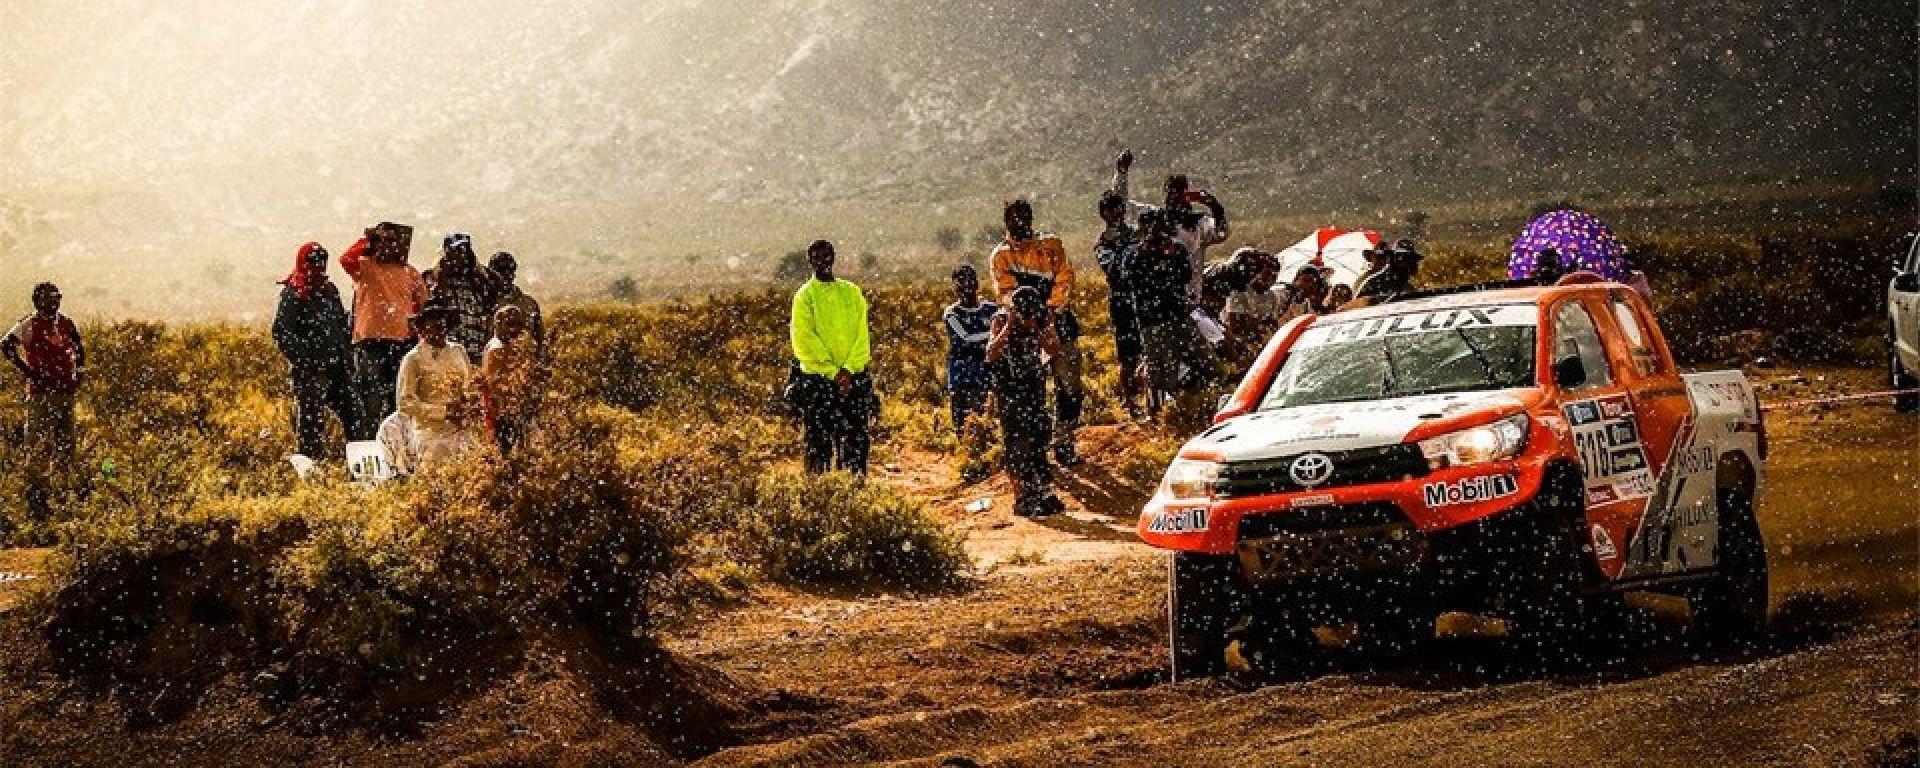 Dakar - Toyota Hilux